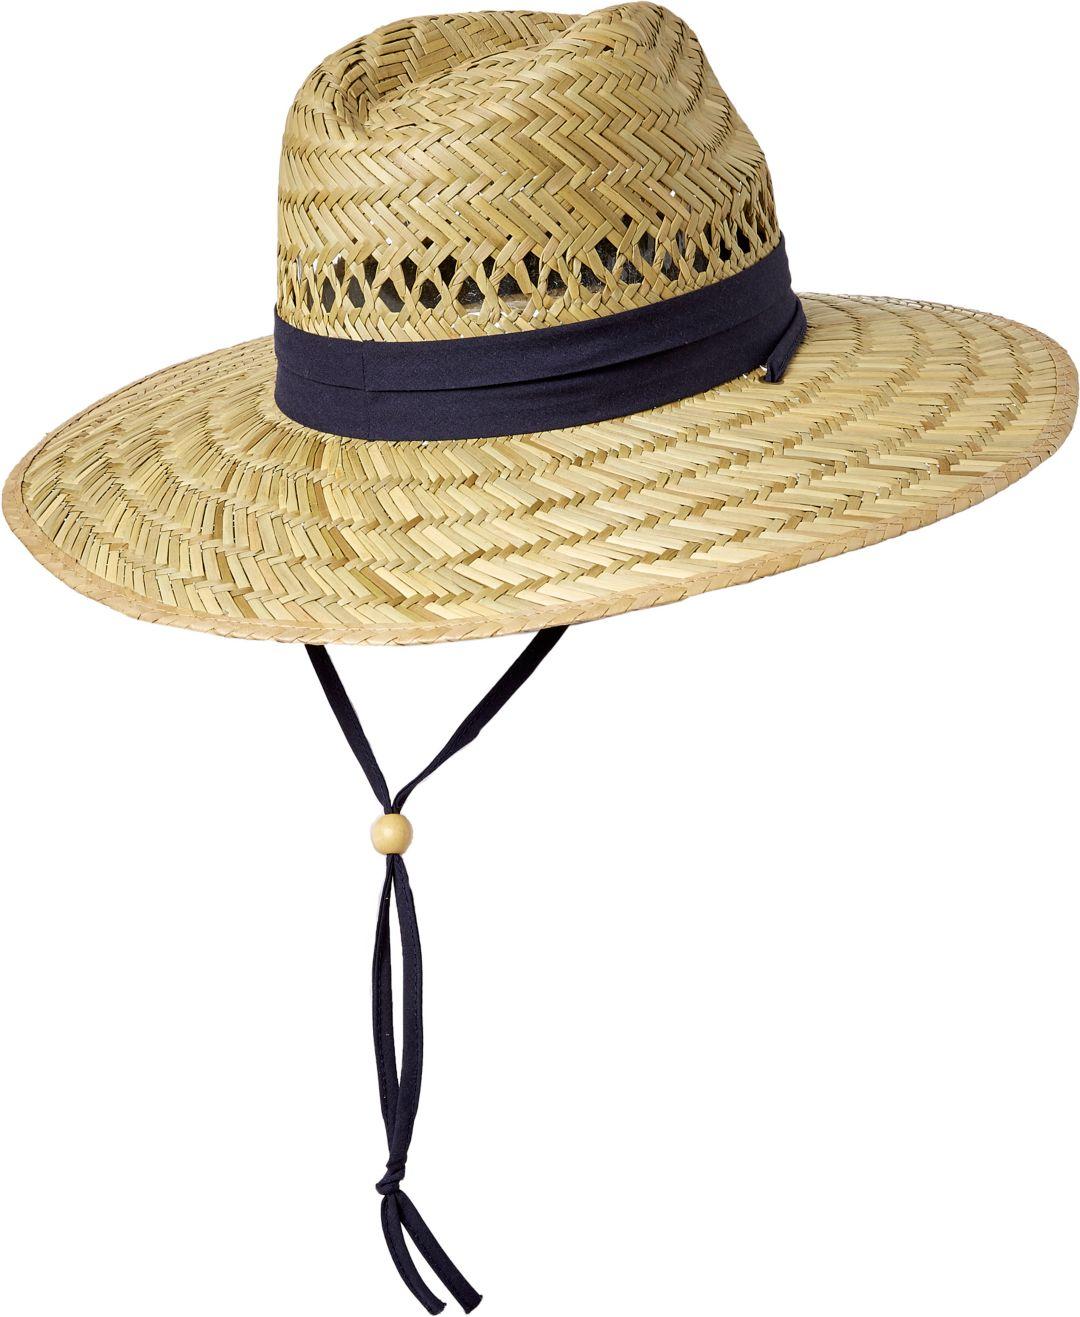 2542a1354326c8 Field & Stream Men's Evershade Lifeguard Hat | DICK'S Sporting Goods